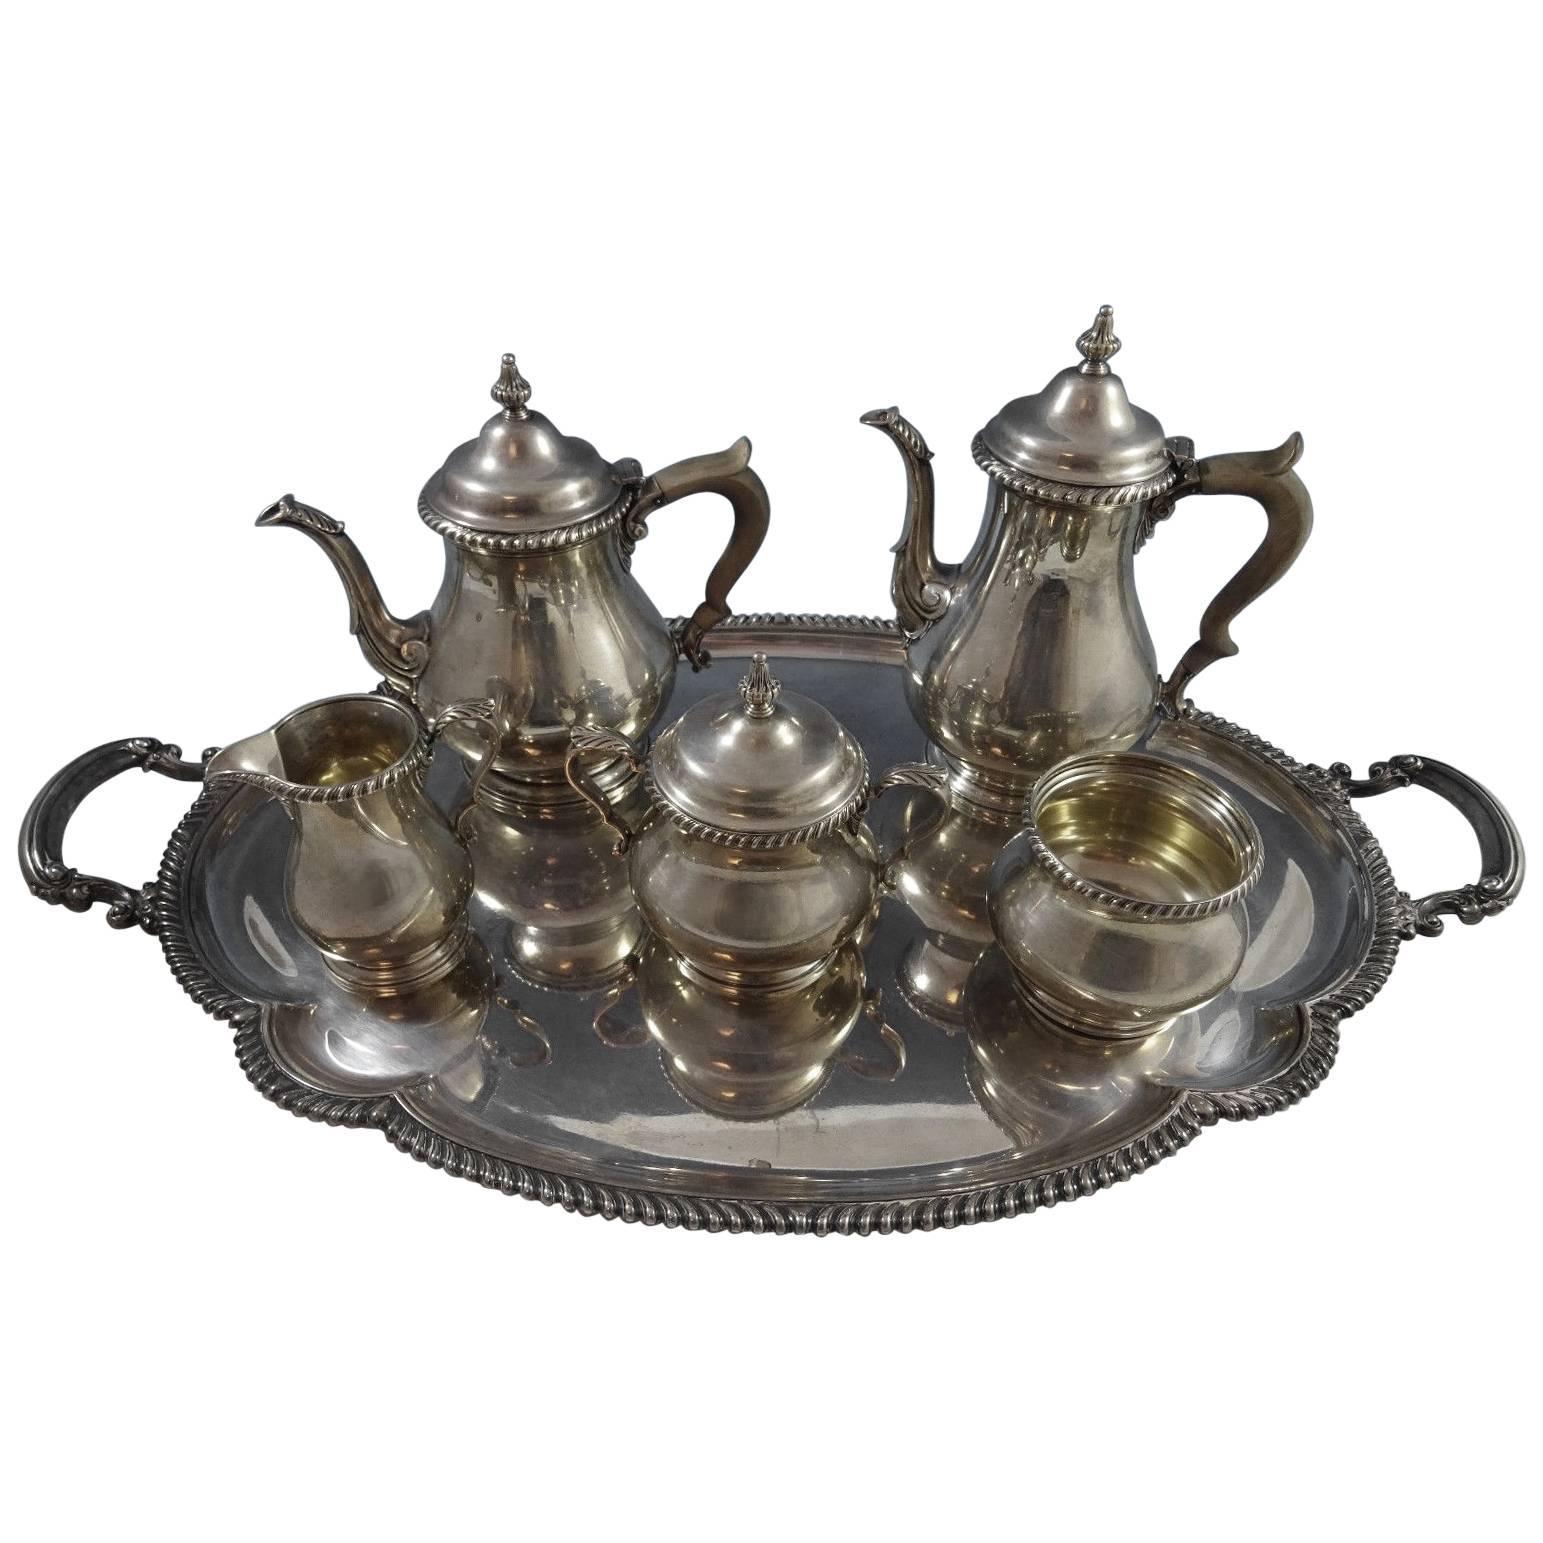 Astonishing Kensington by Gorham Sterling Silver Tea Set Six-Piece SKU #1188